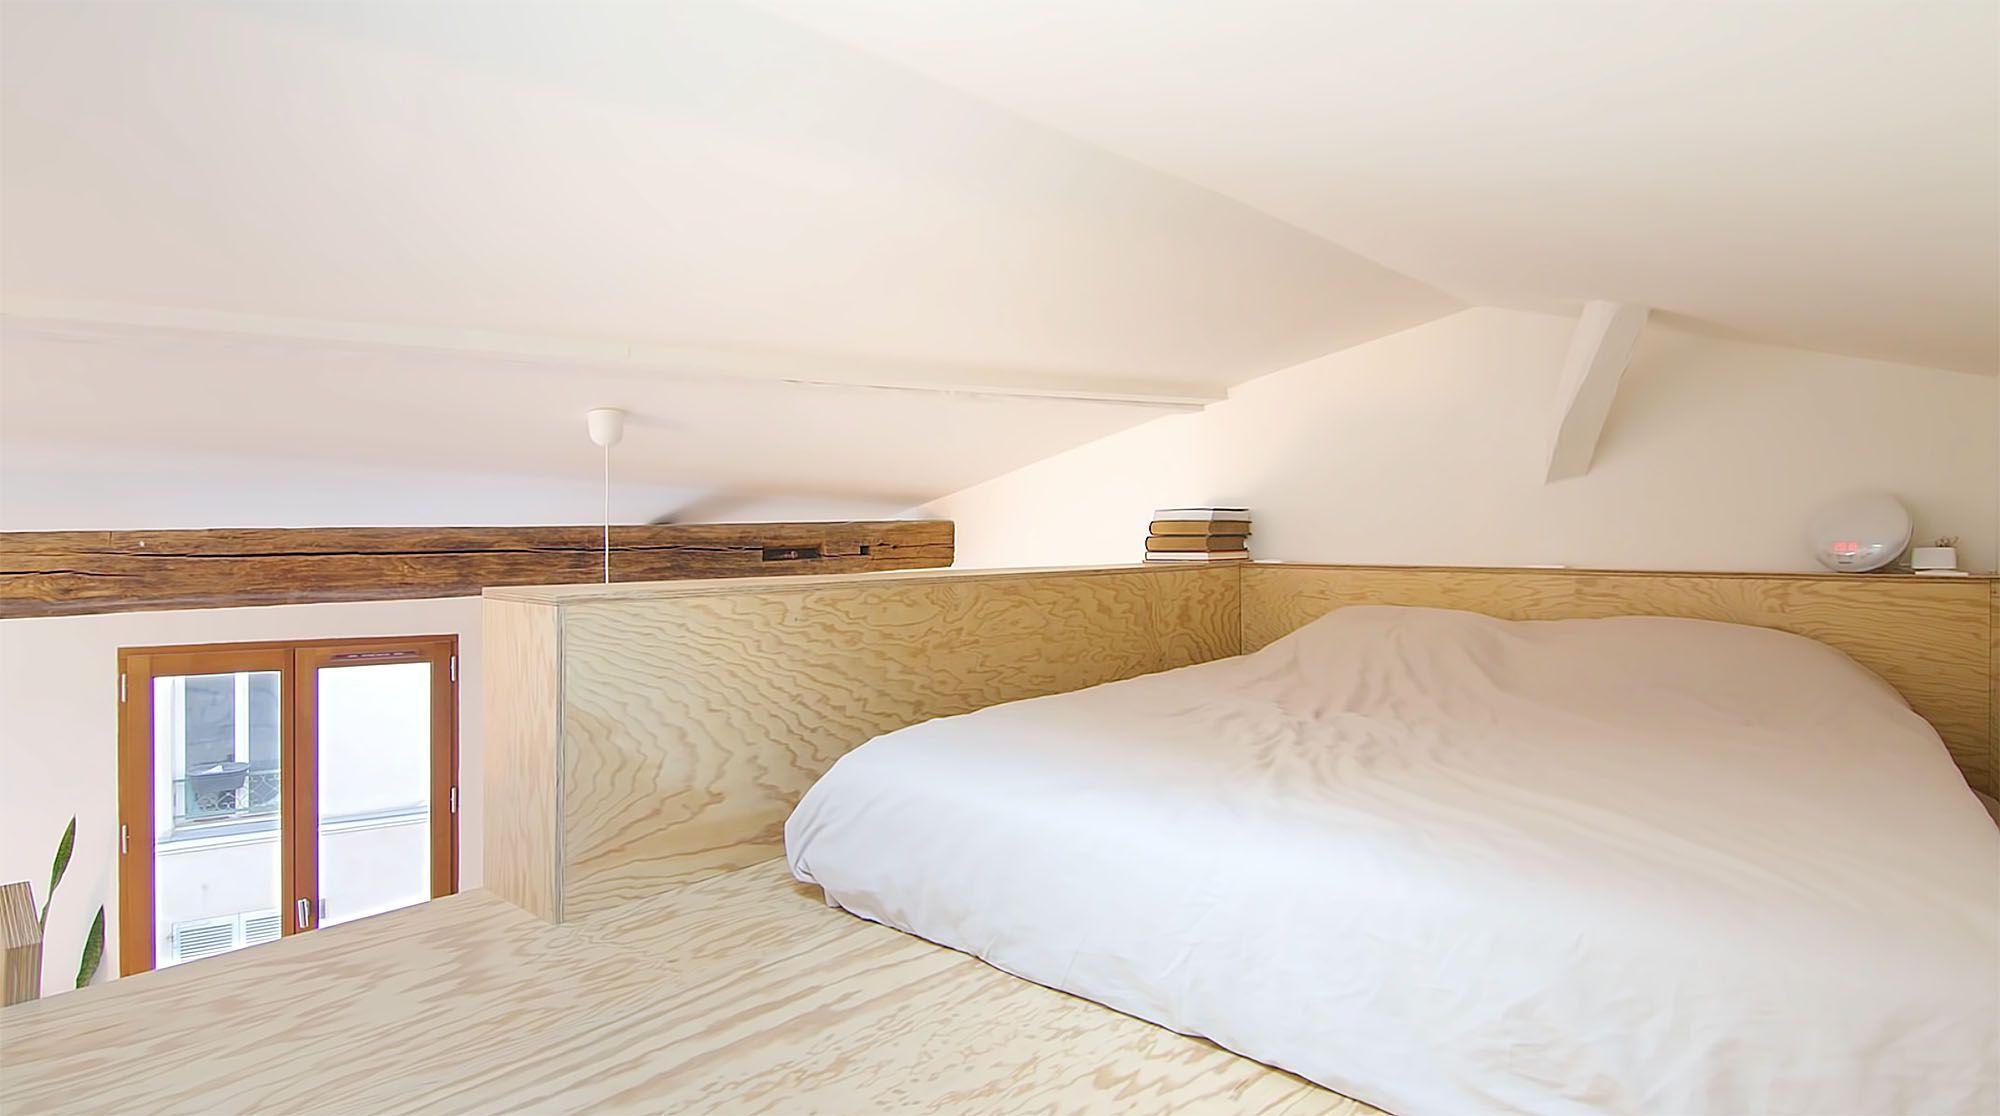 Jourdain micro-apartment renovation Matthieu Torres sleeping mezzanine